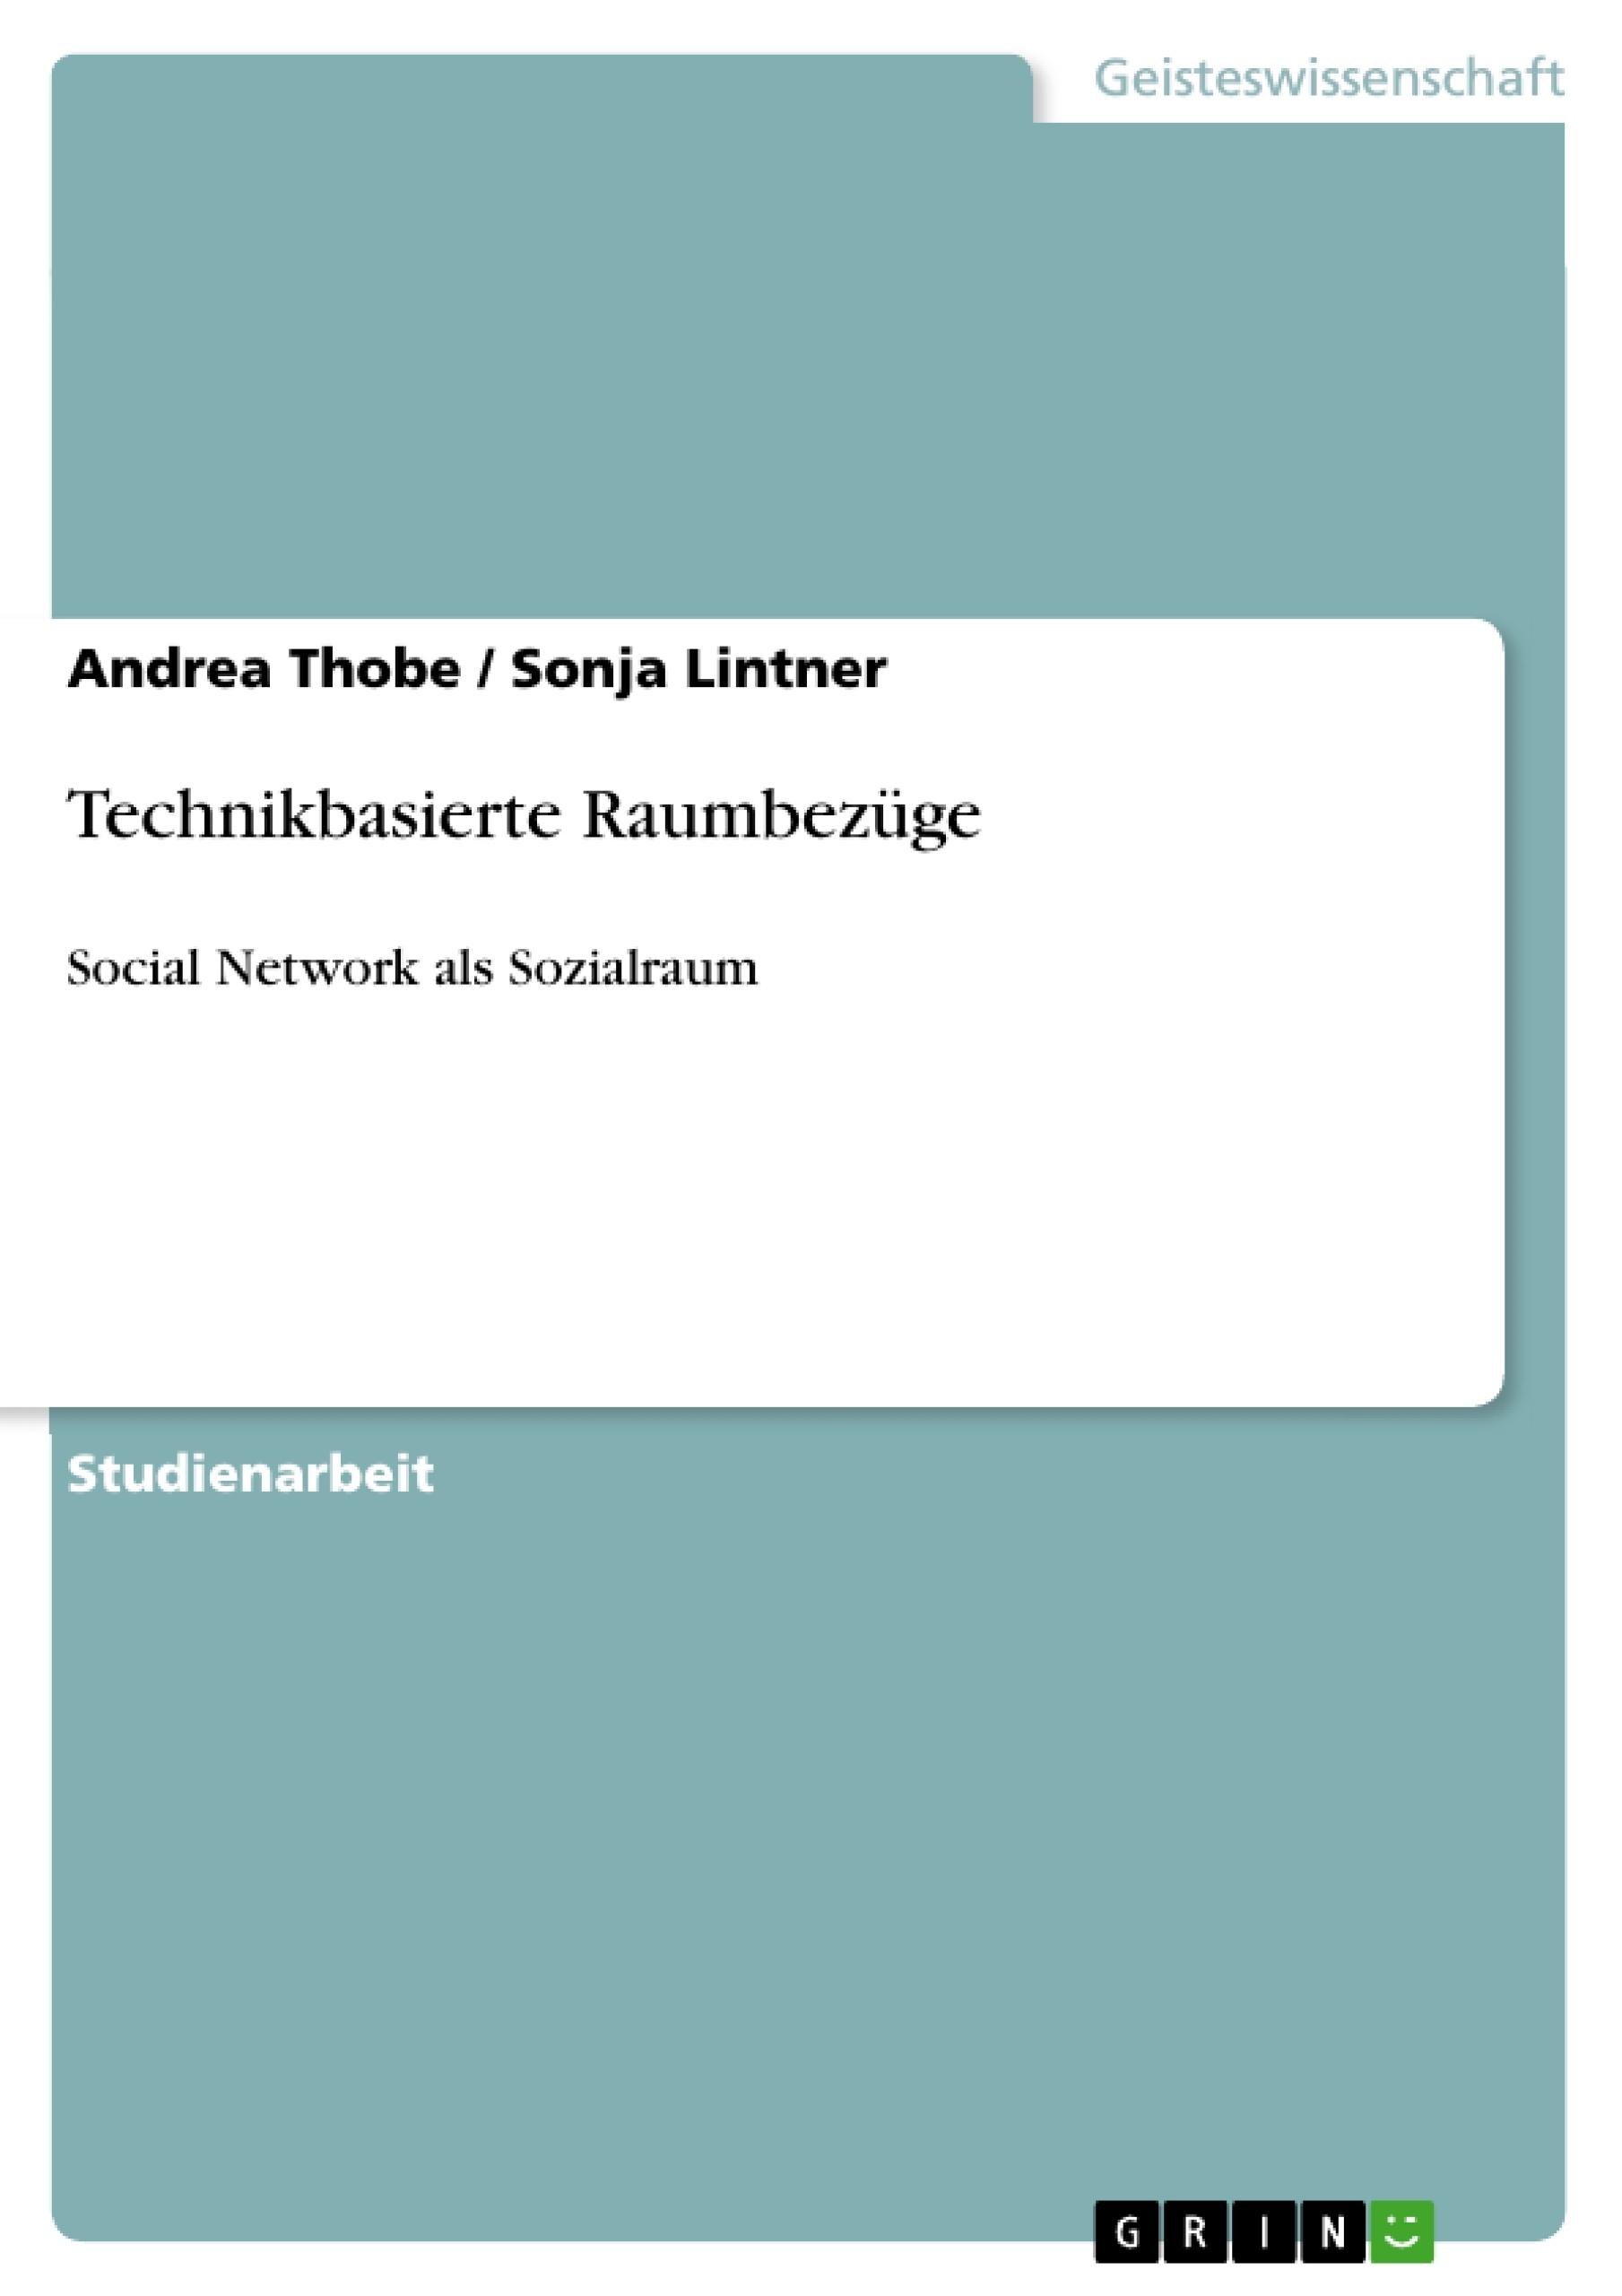 Titel: Technikbasierte Raumbezüge